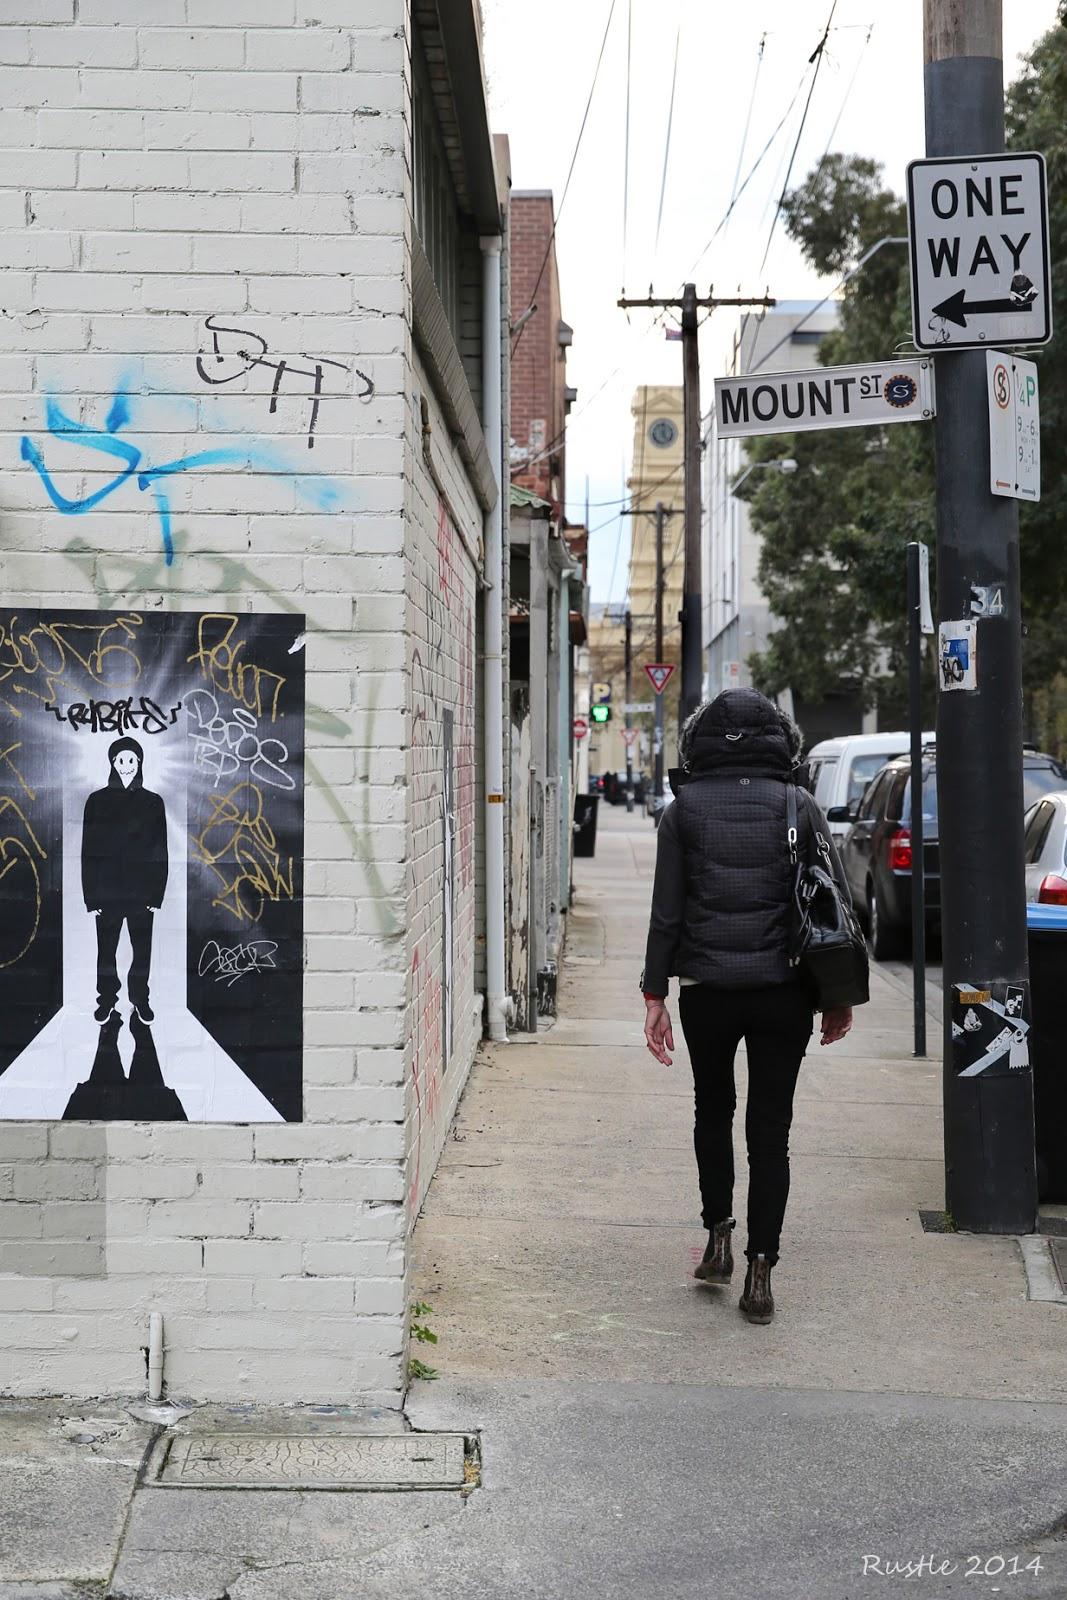 Melbourne's staple black